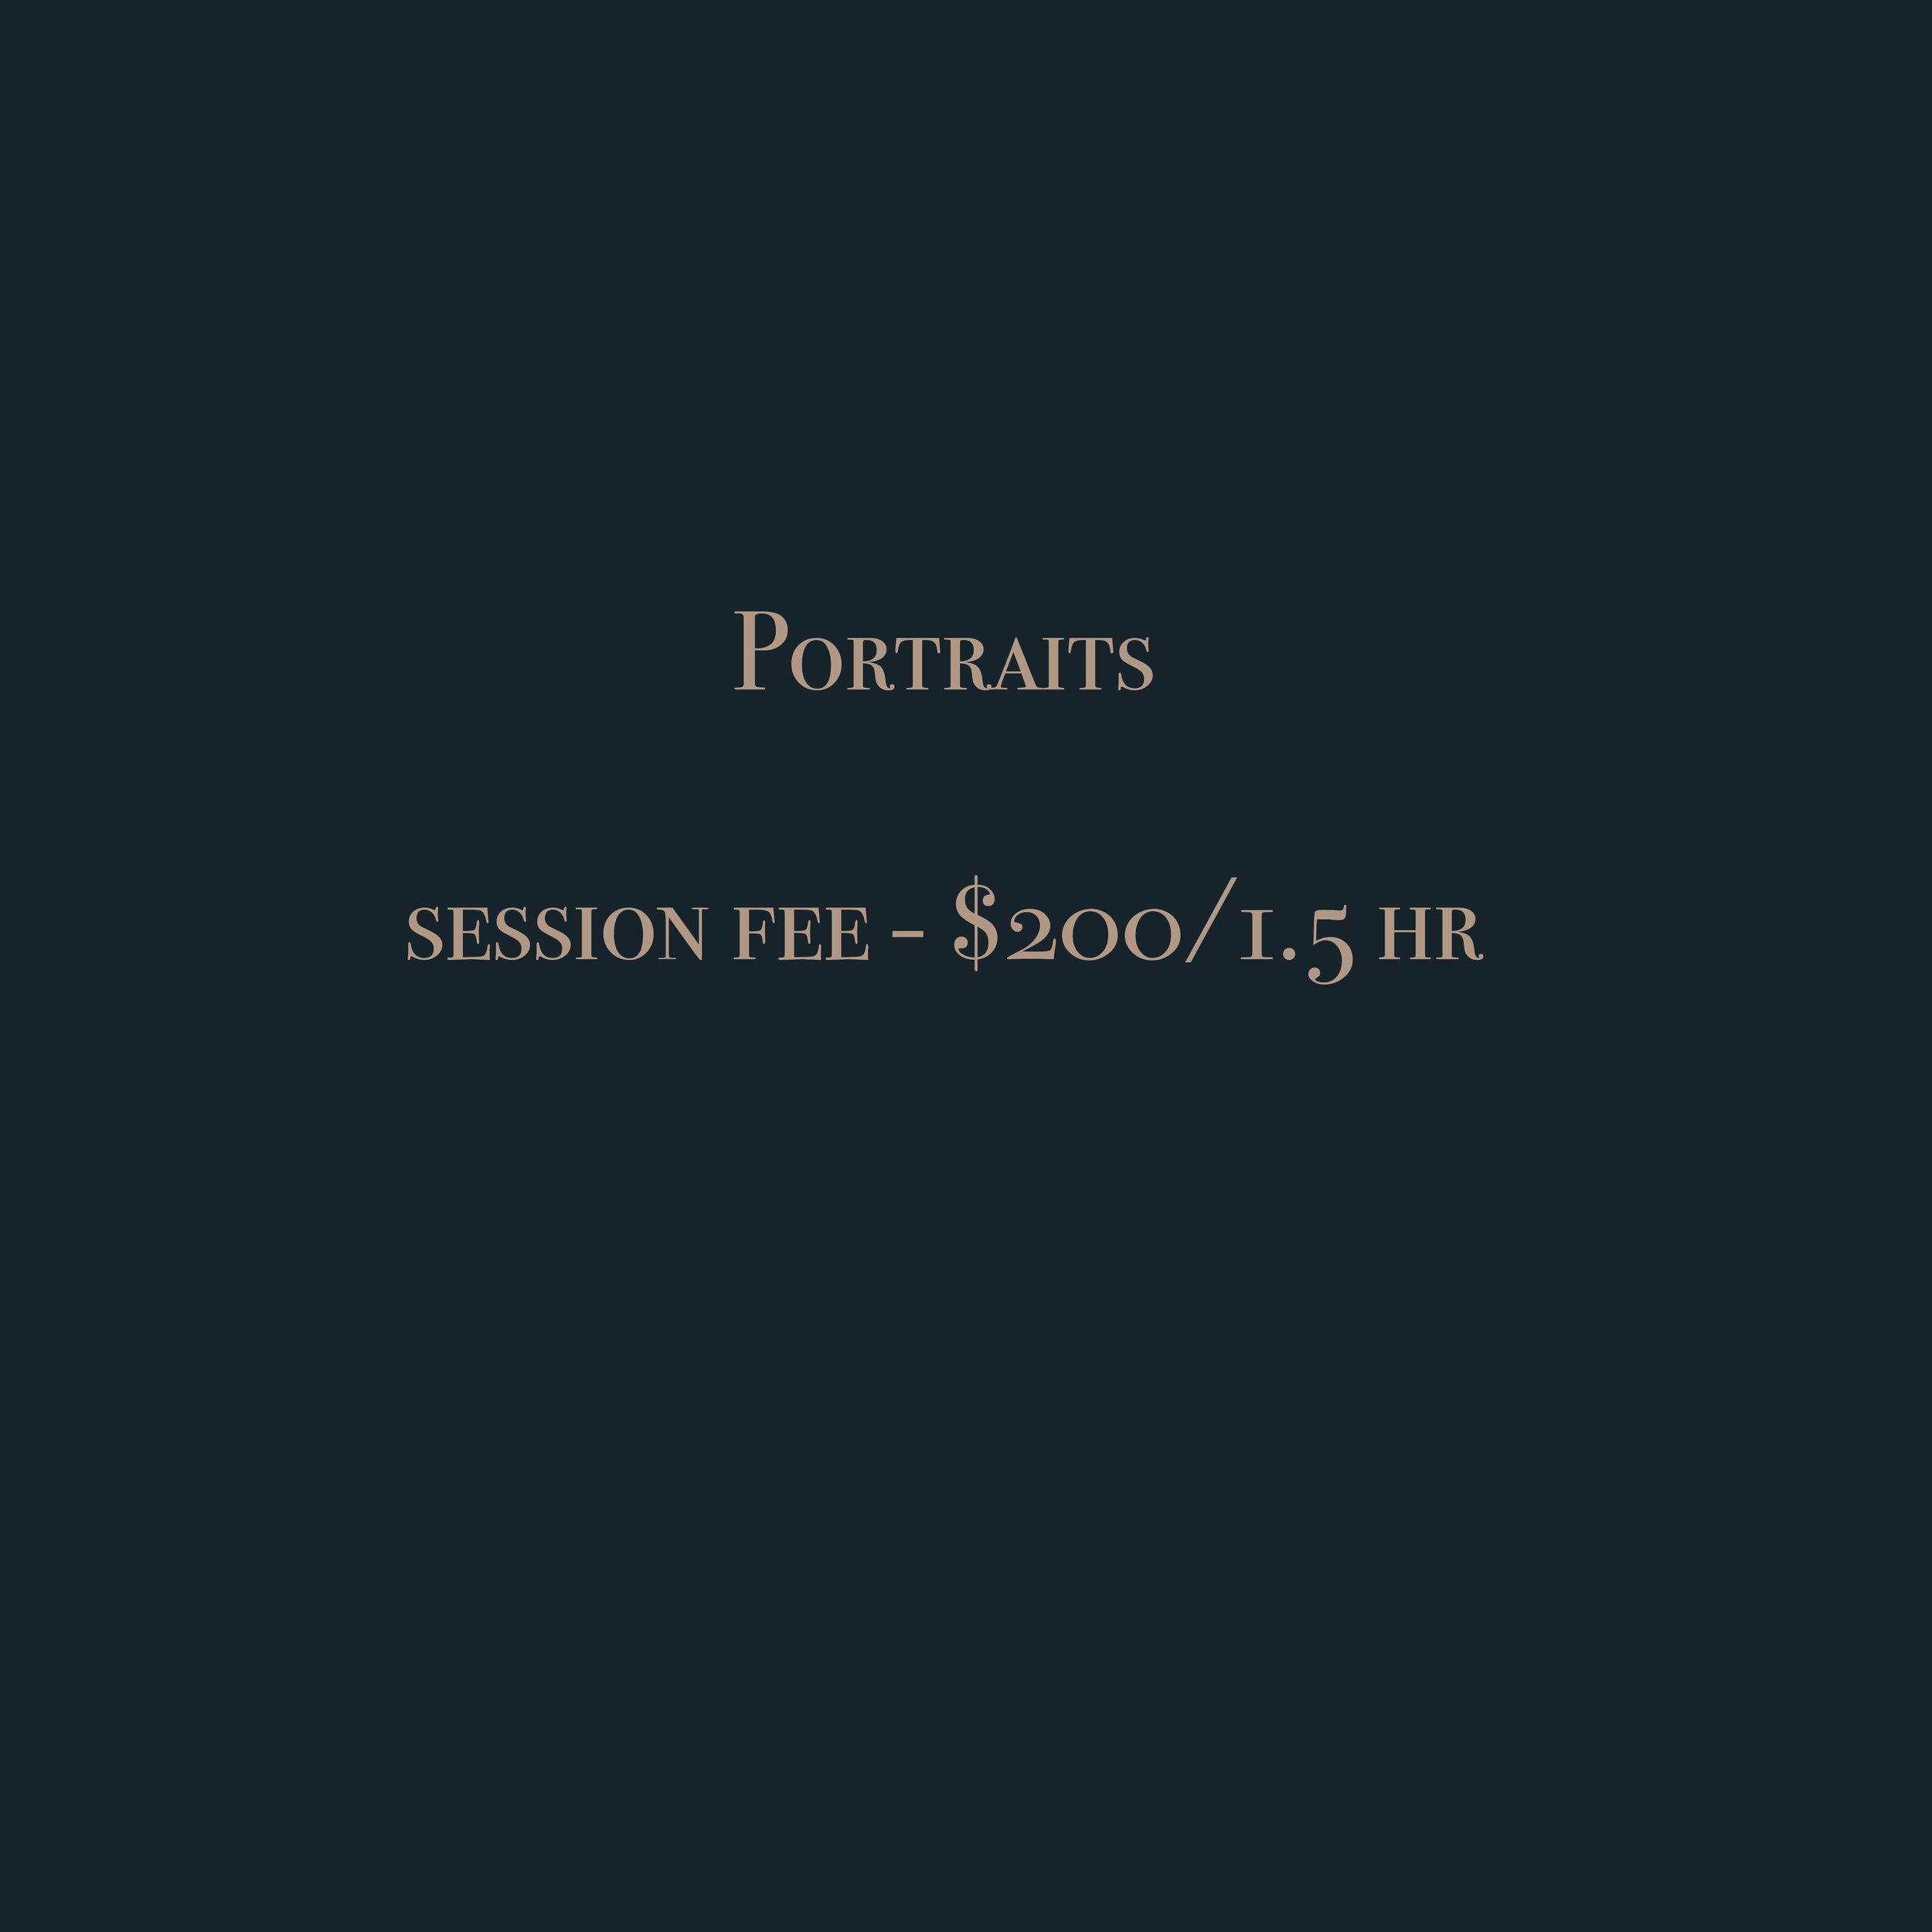 portrait session fee 5.jpg